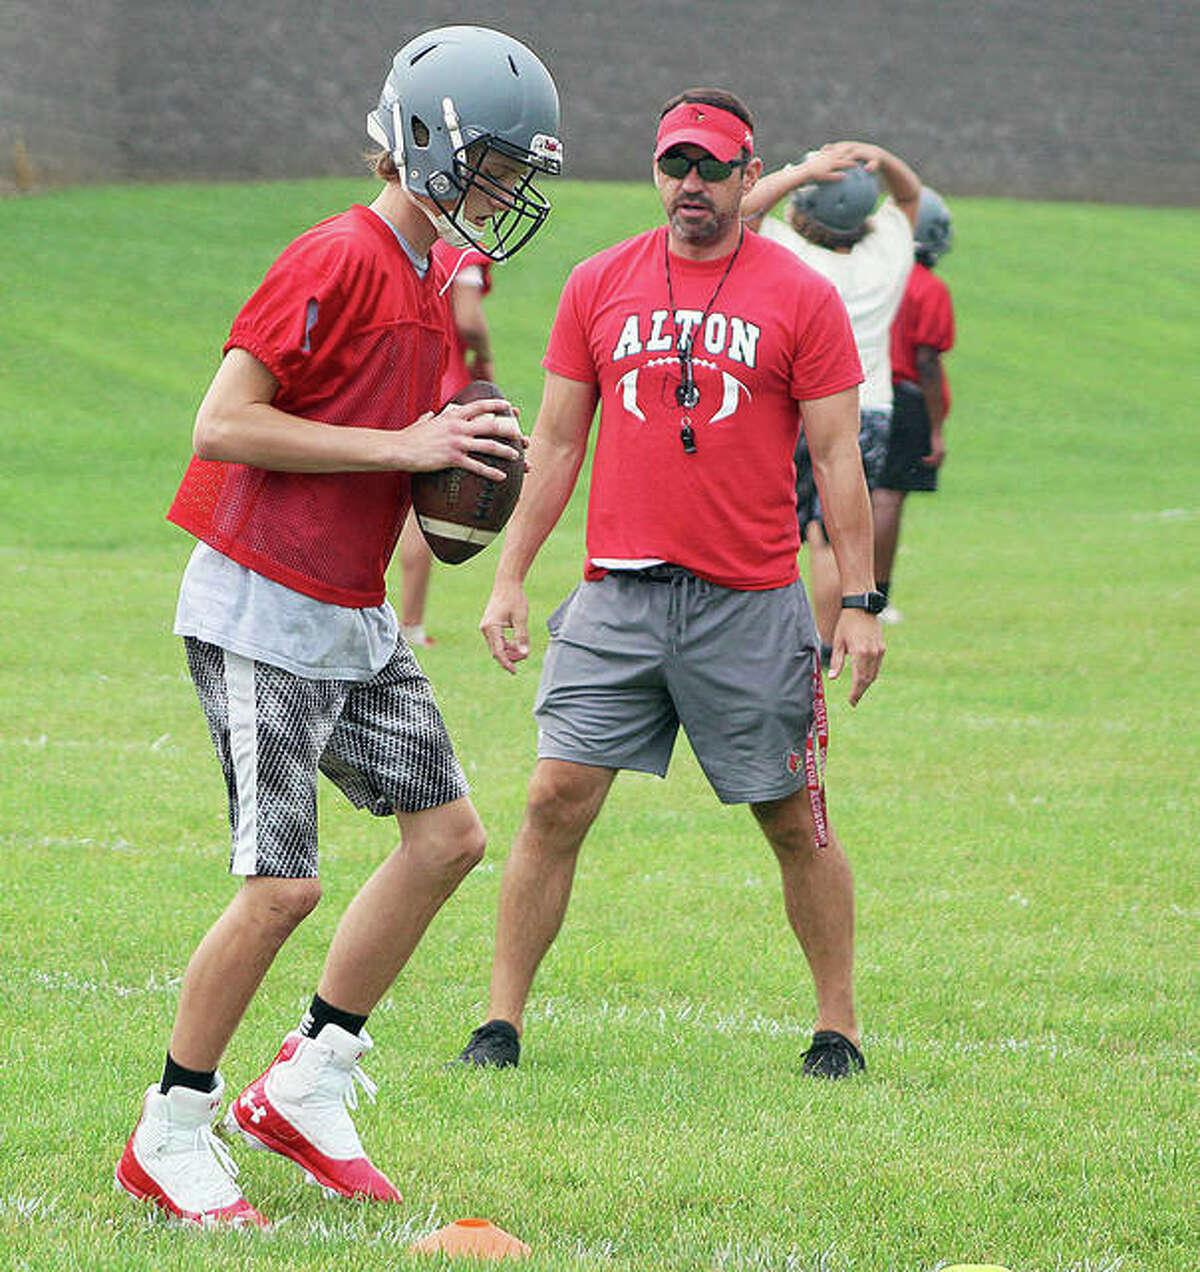 Alton coach Eric Dickerson watches freshman quarterback Aaron Humm drop back during a preseason practice at Alton High School.